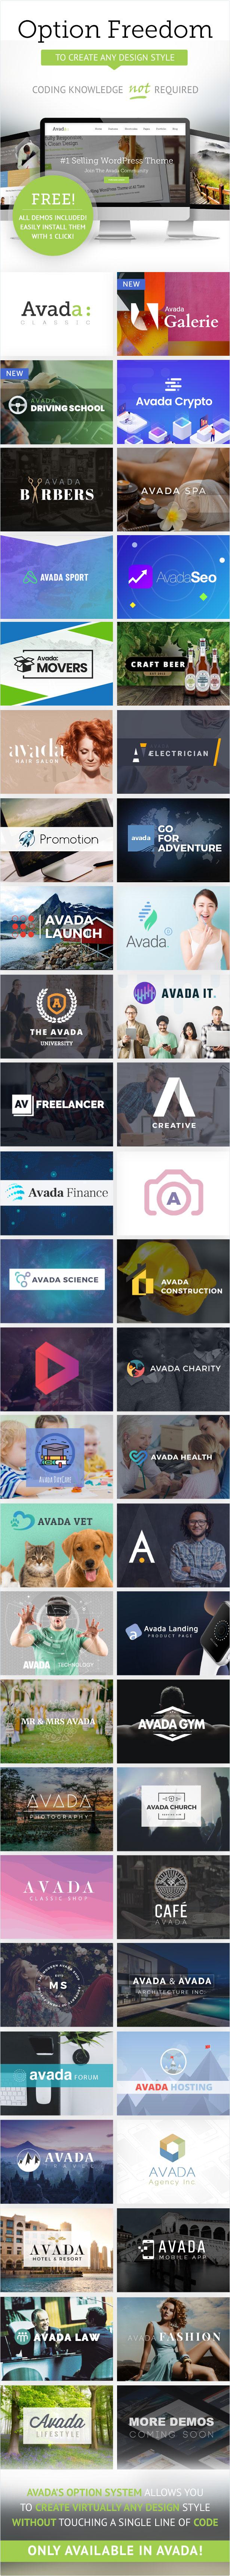 Avada | Responsive Multi-Purpose Theme - 10